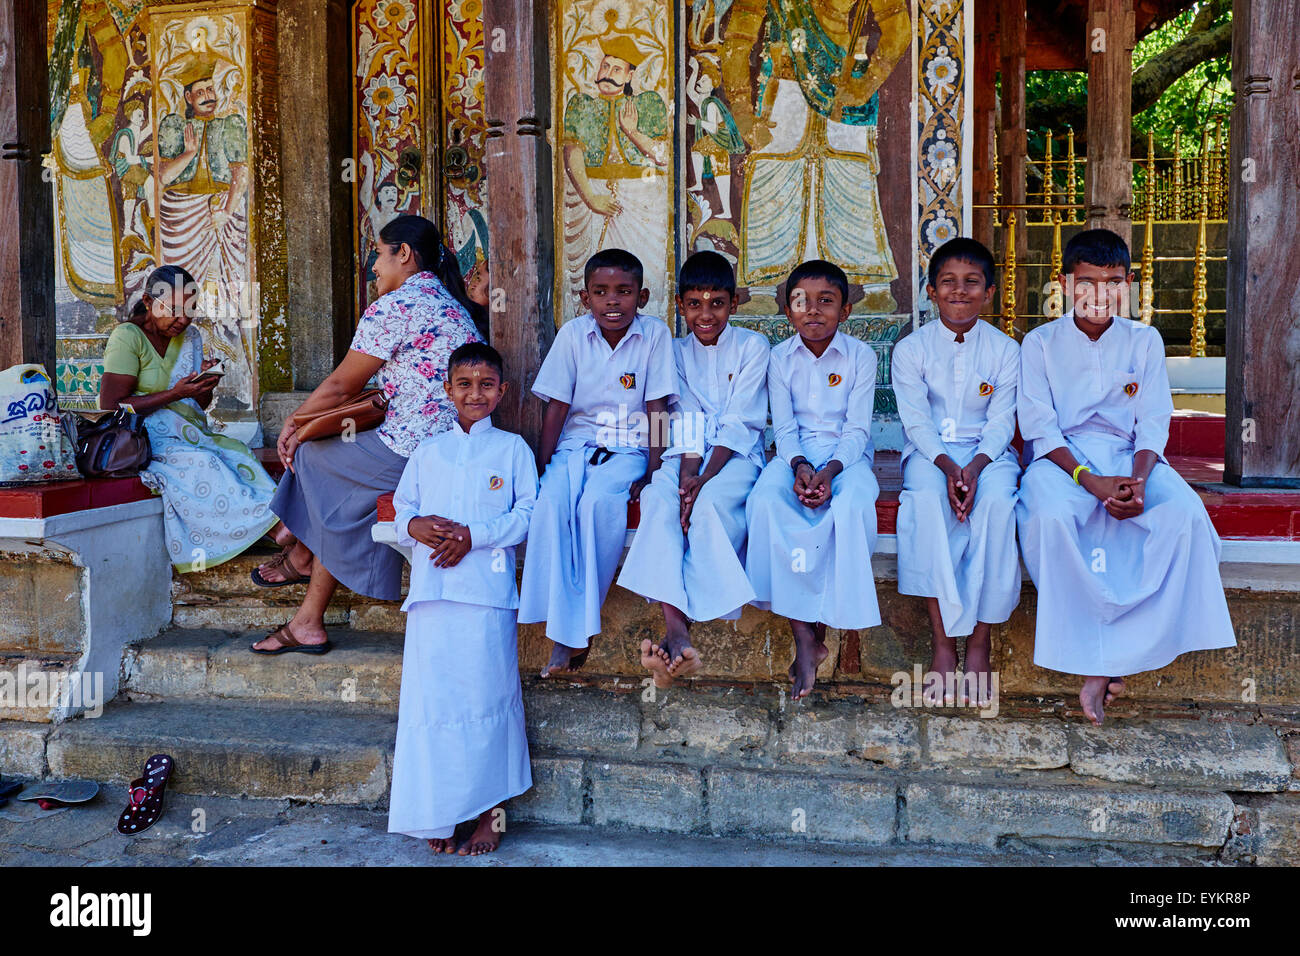 Sri Lanka, Ceylon, North Central Province, Kandy, UNESCO World Heritage city, Tooth's temple, schoolchildren - Stock Image